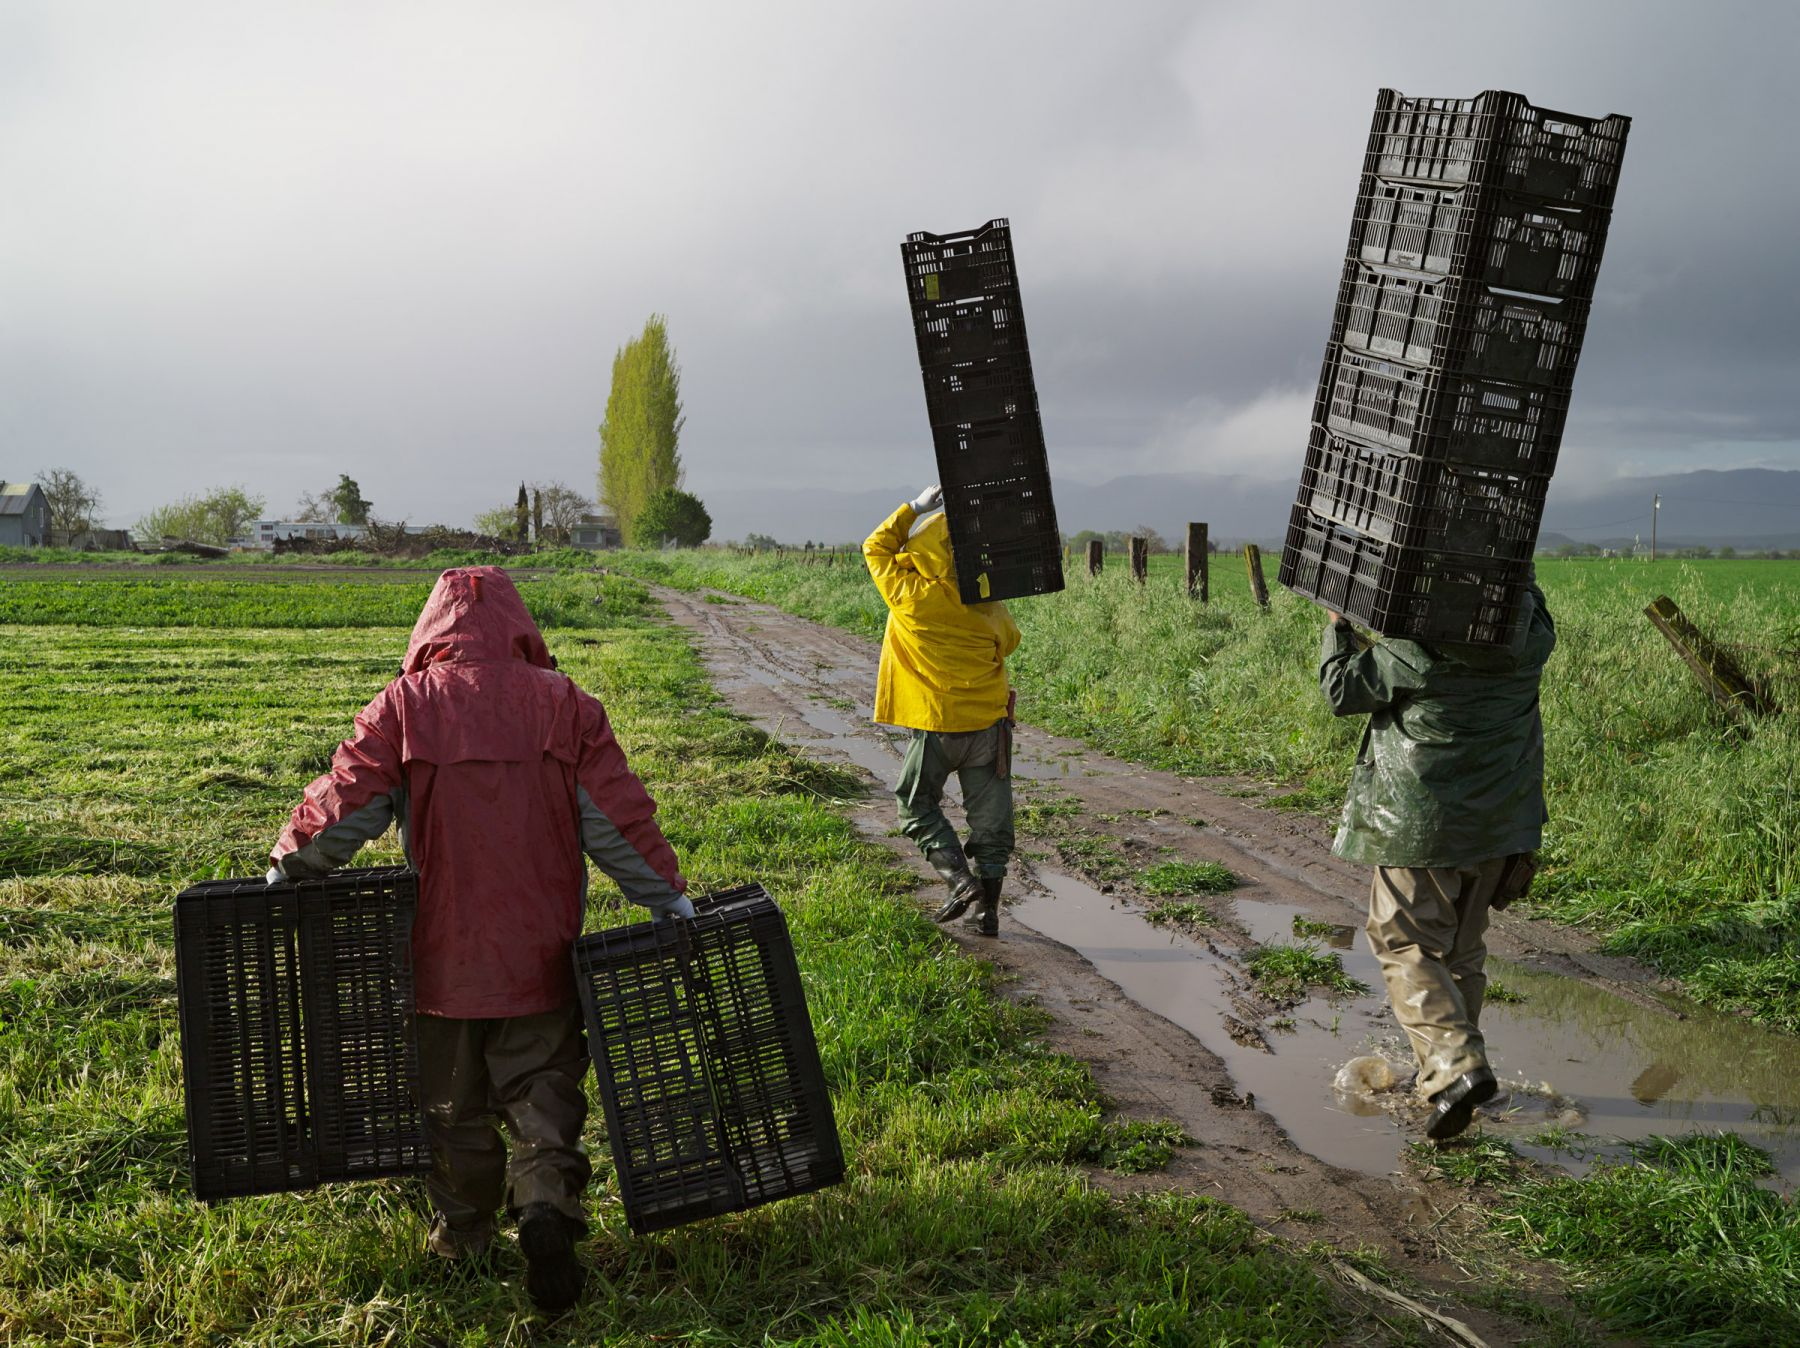 LUCAS FOGLIAJesús, José, and Luis Harvesting Turnips and Miner's Lettuce, Heirloom Organic Gardens, California, 2011